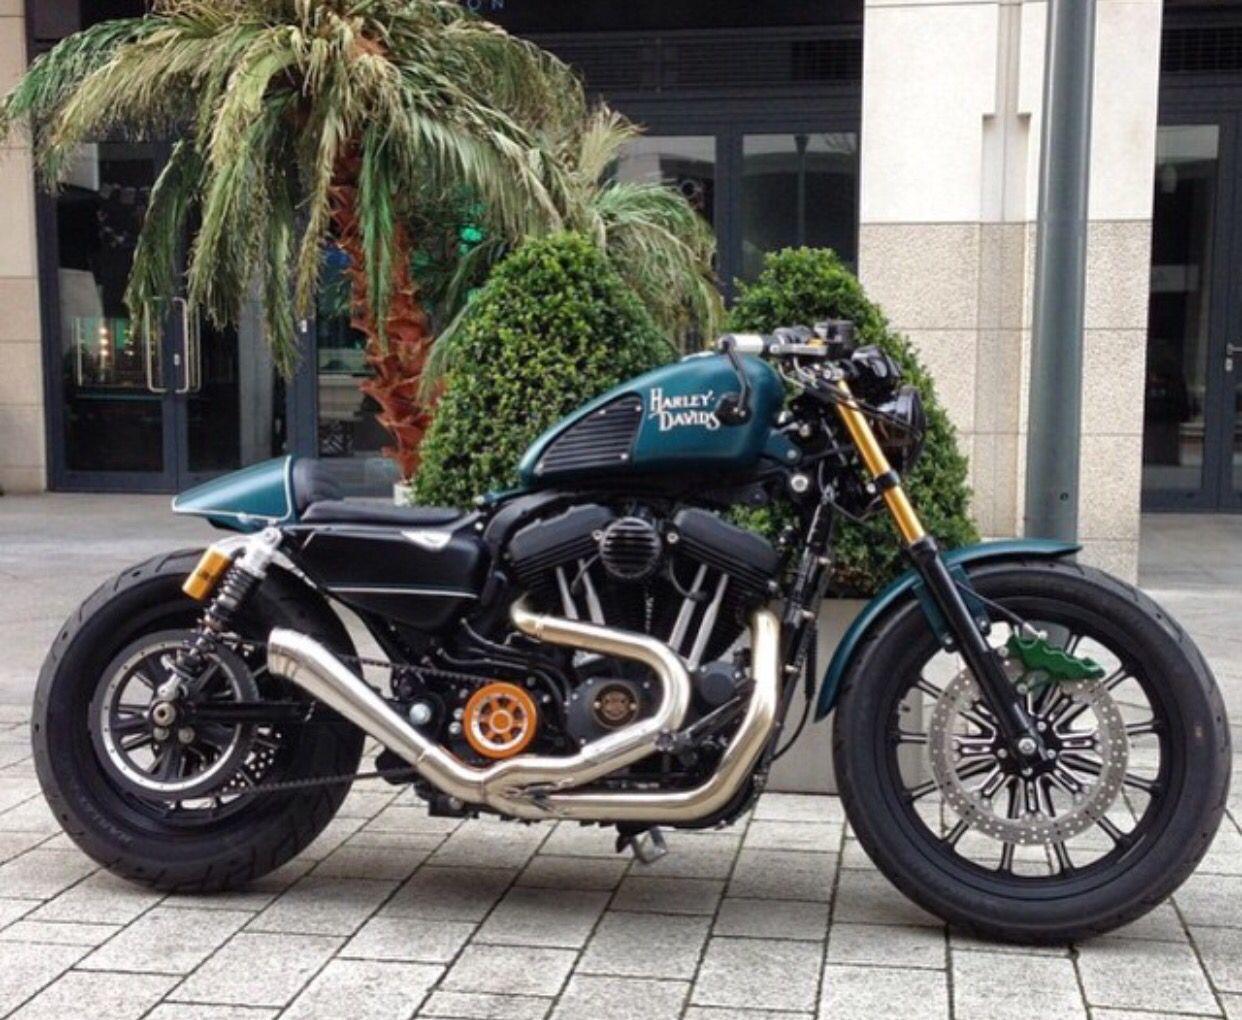 Harley Davidson sportster motorcycle HarleyDavidsonTrike